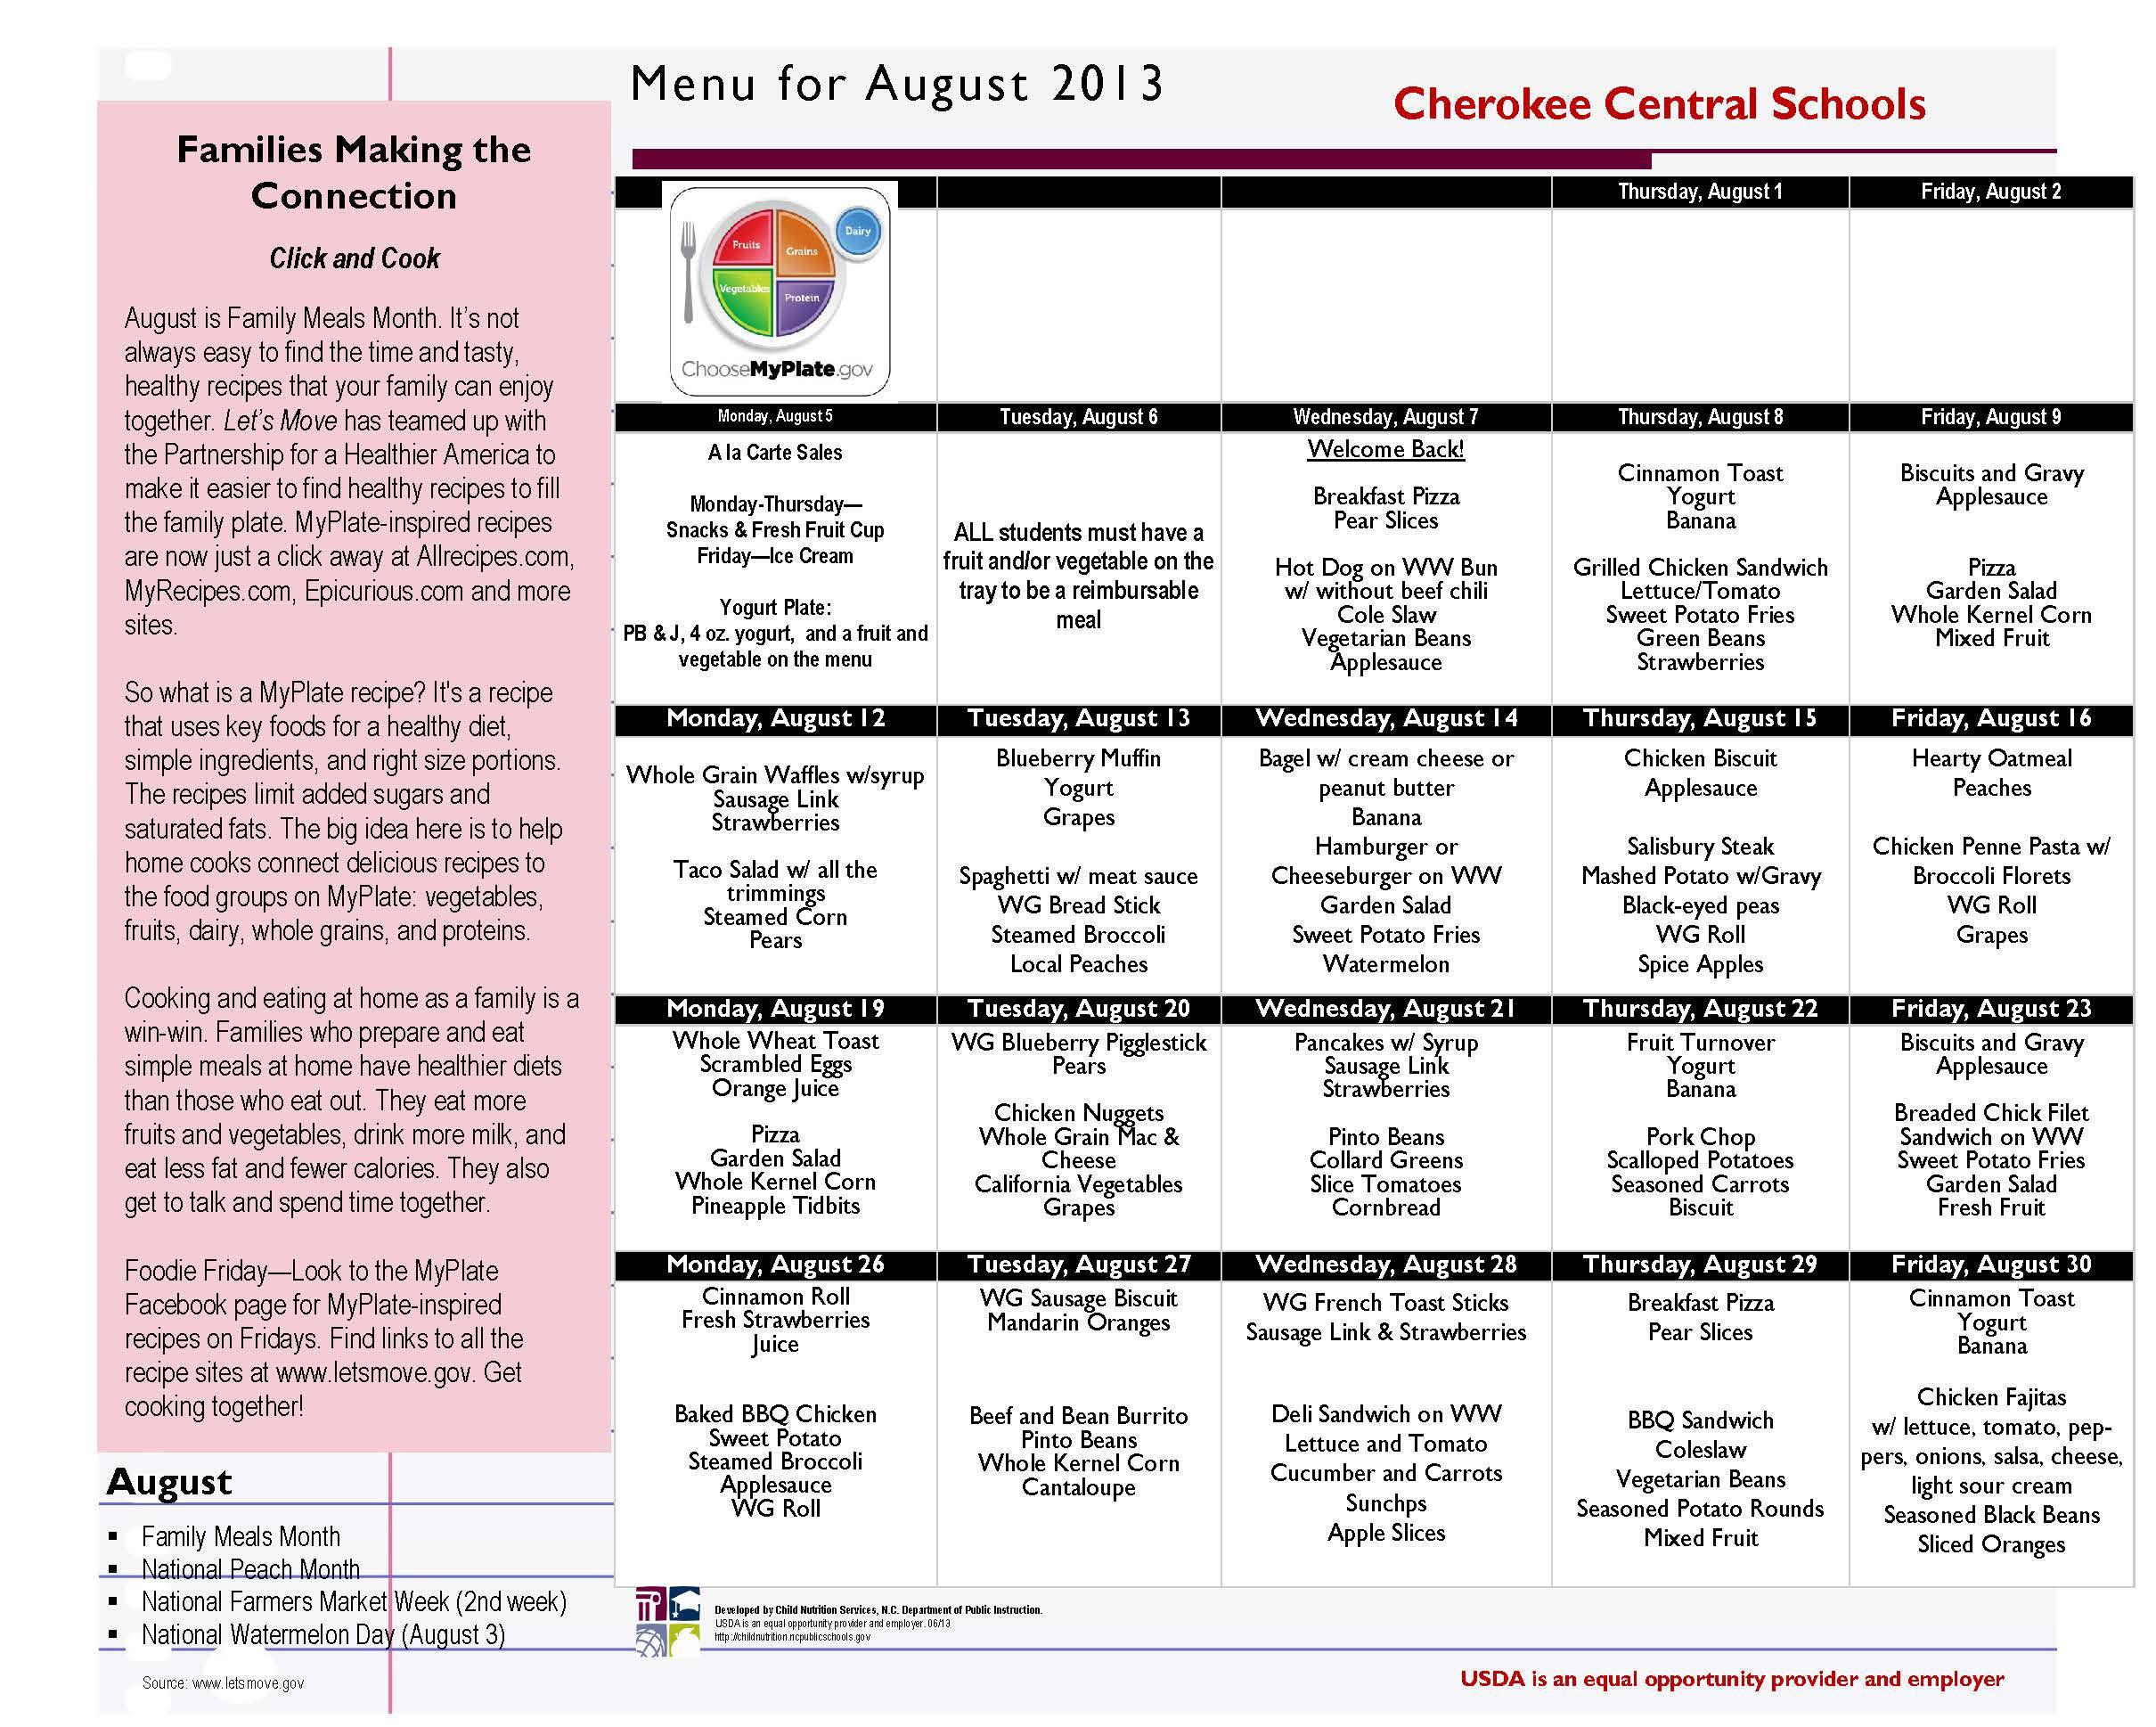 CCS August 2013 Menu